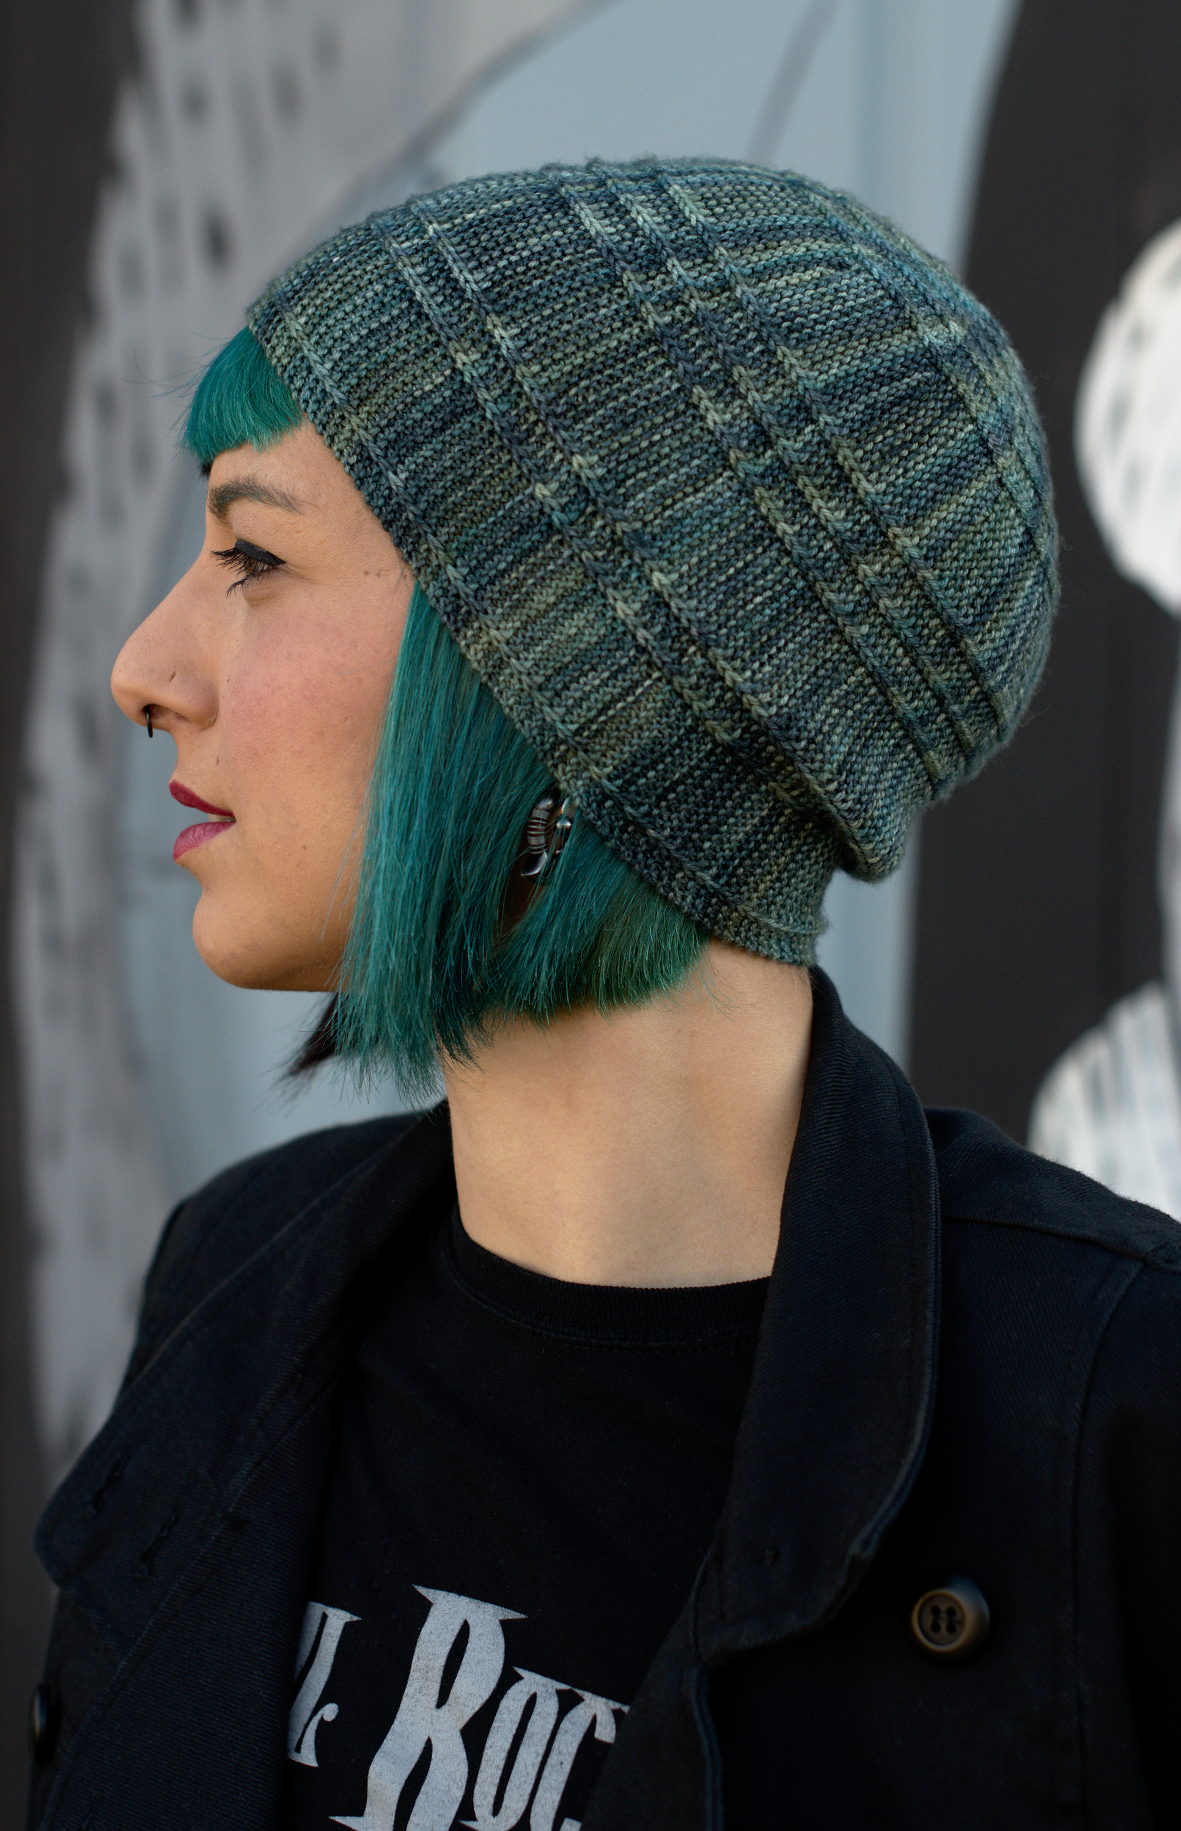 Circled 2 sideways knit Hat knitting pattern with fibonacci offset rings